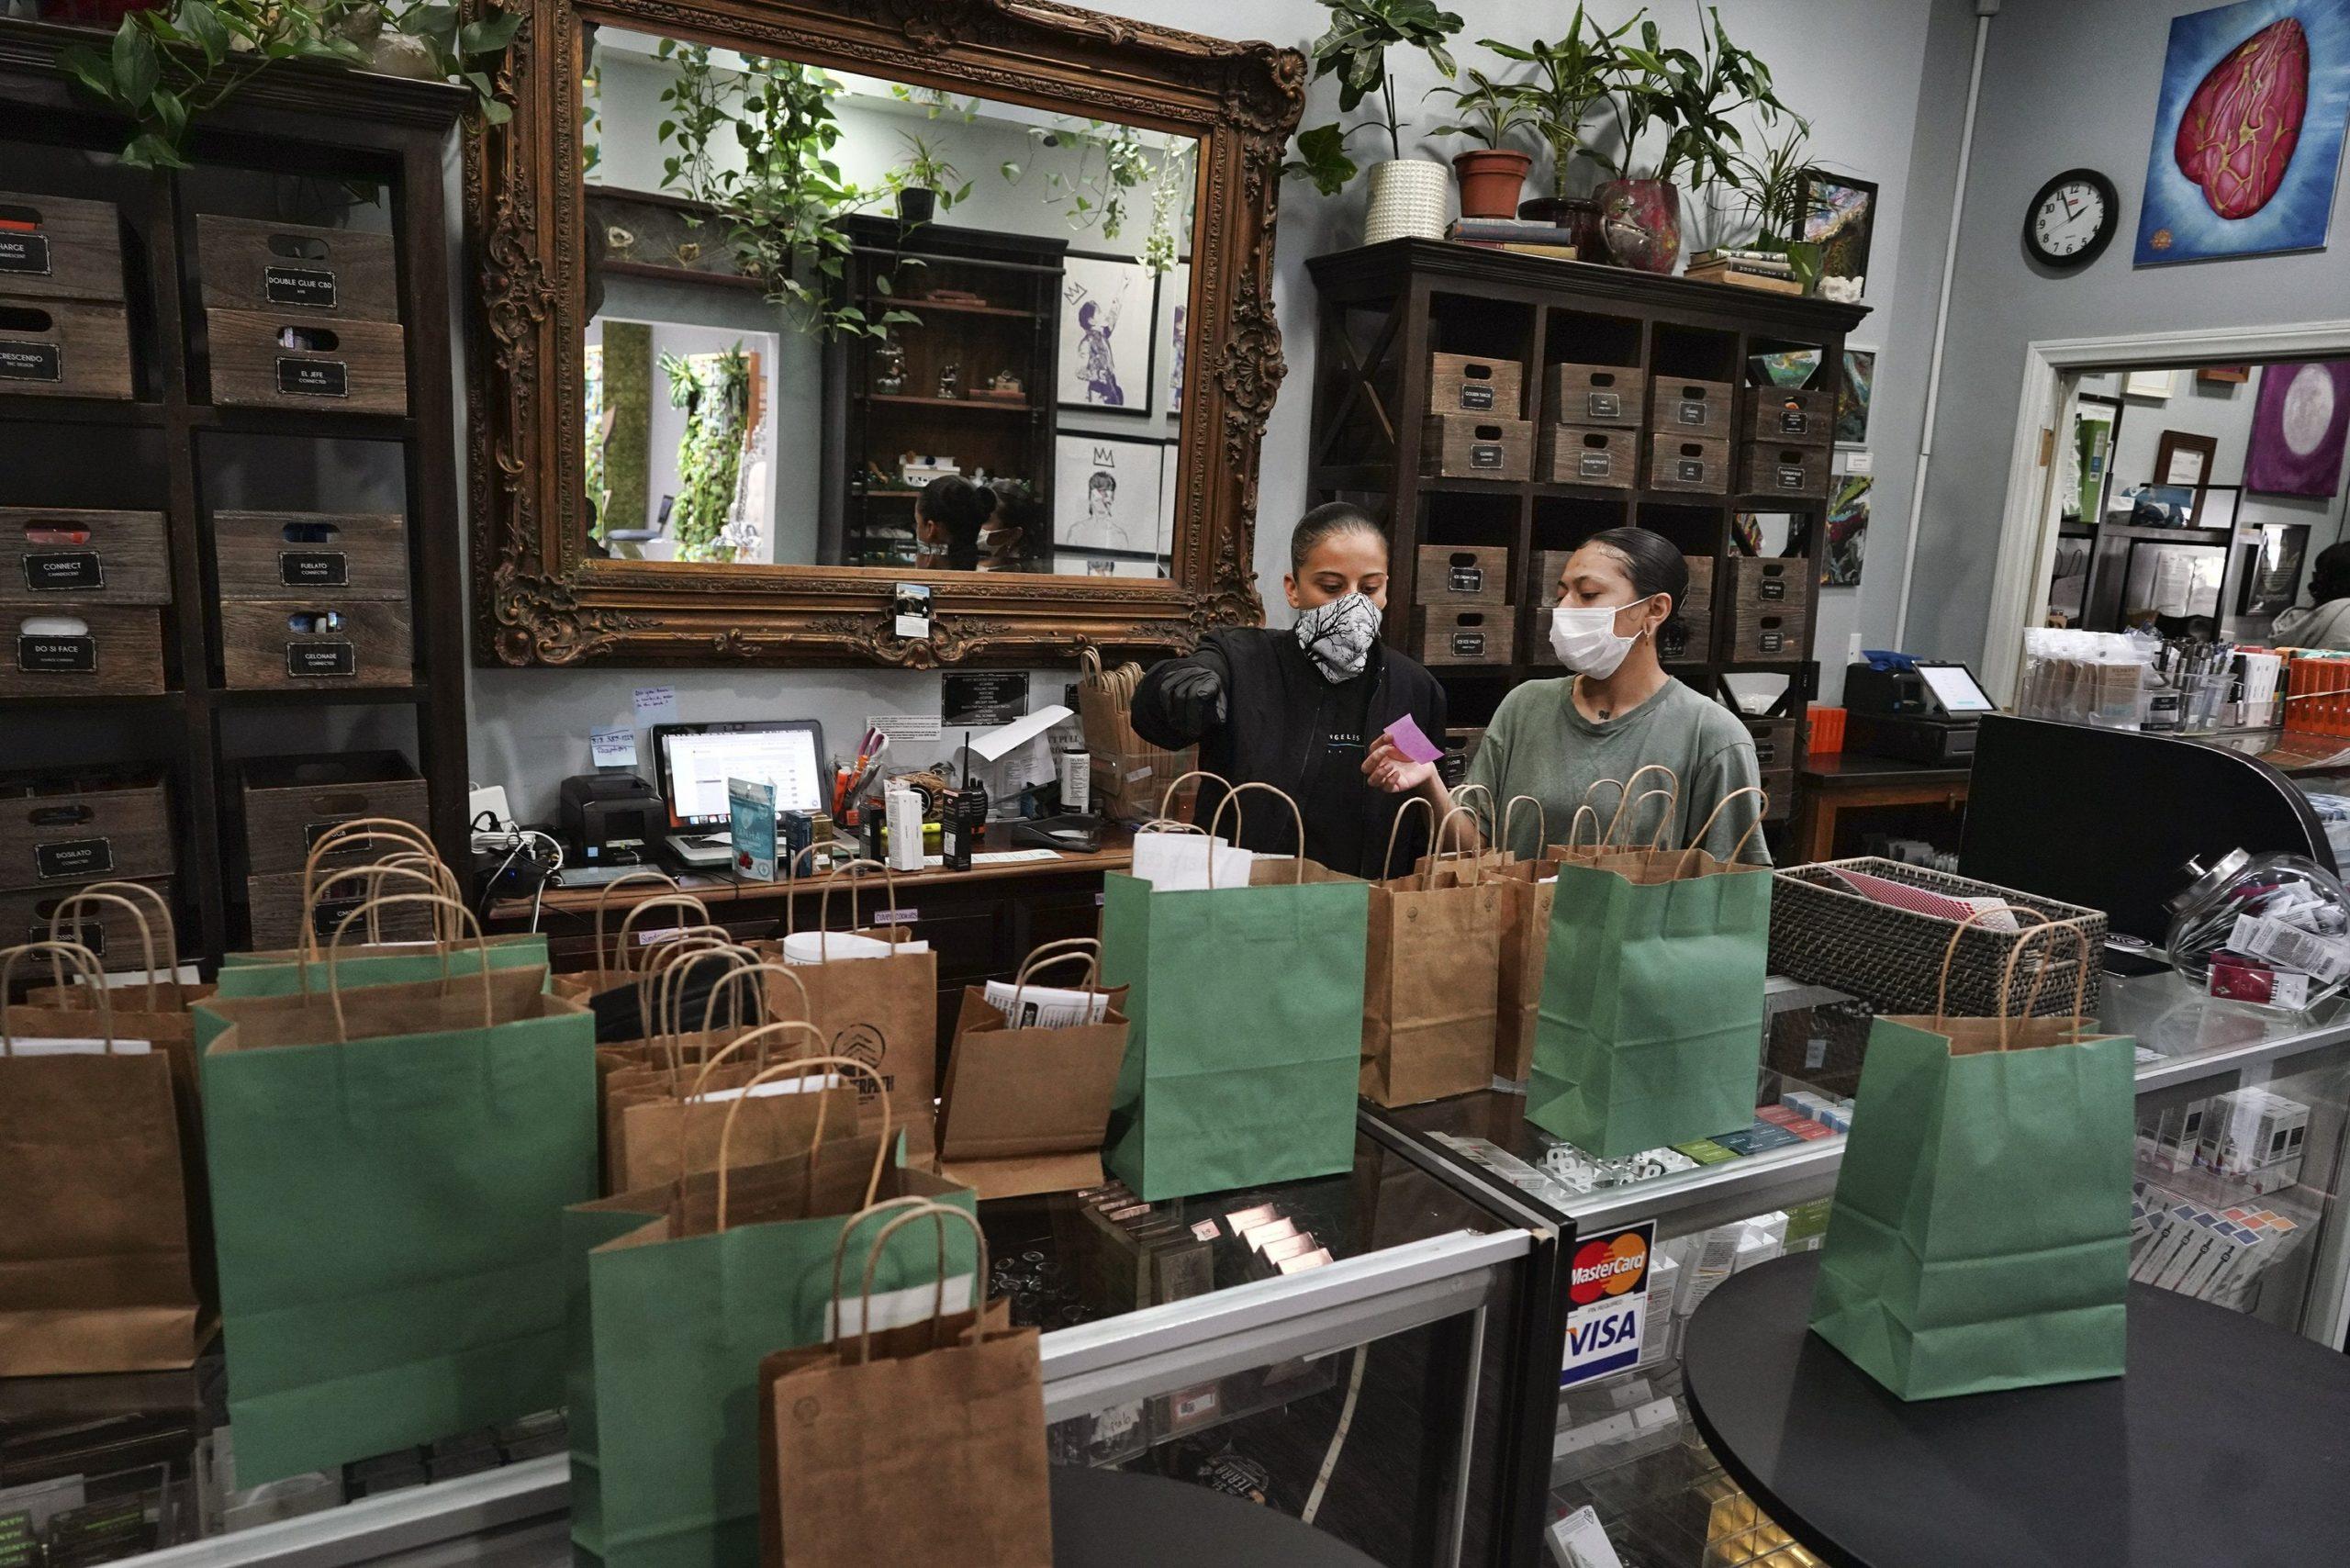 Los Angeles to reset troubled marijuana licensing program